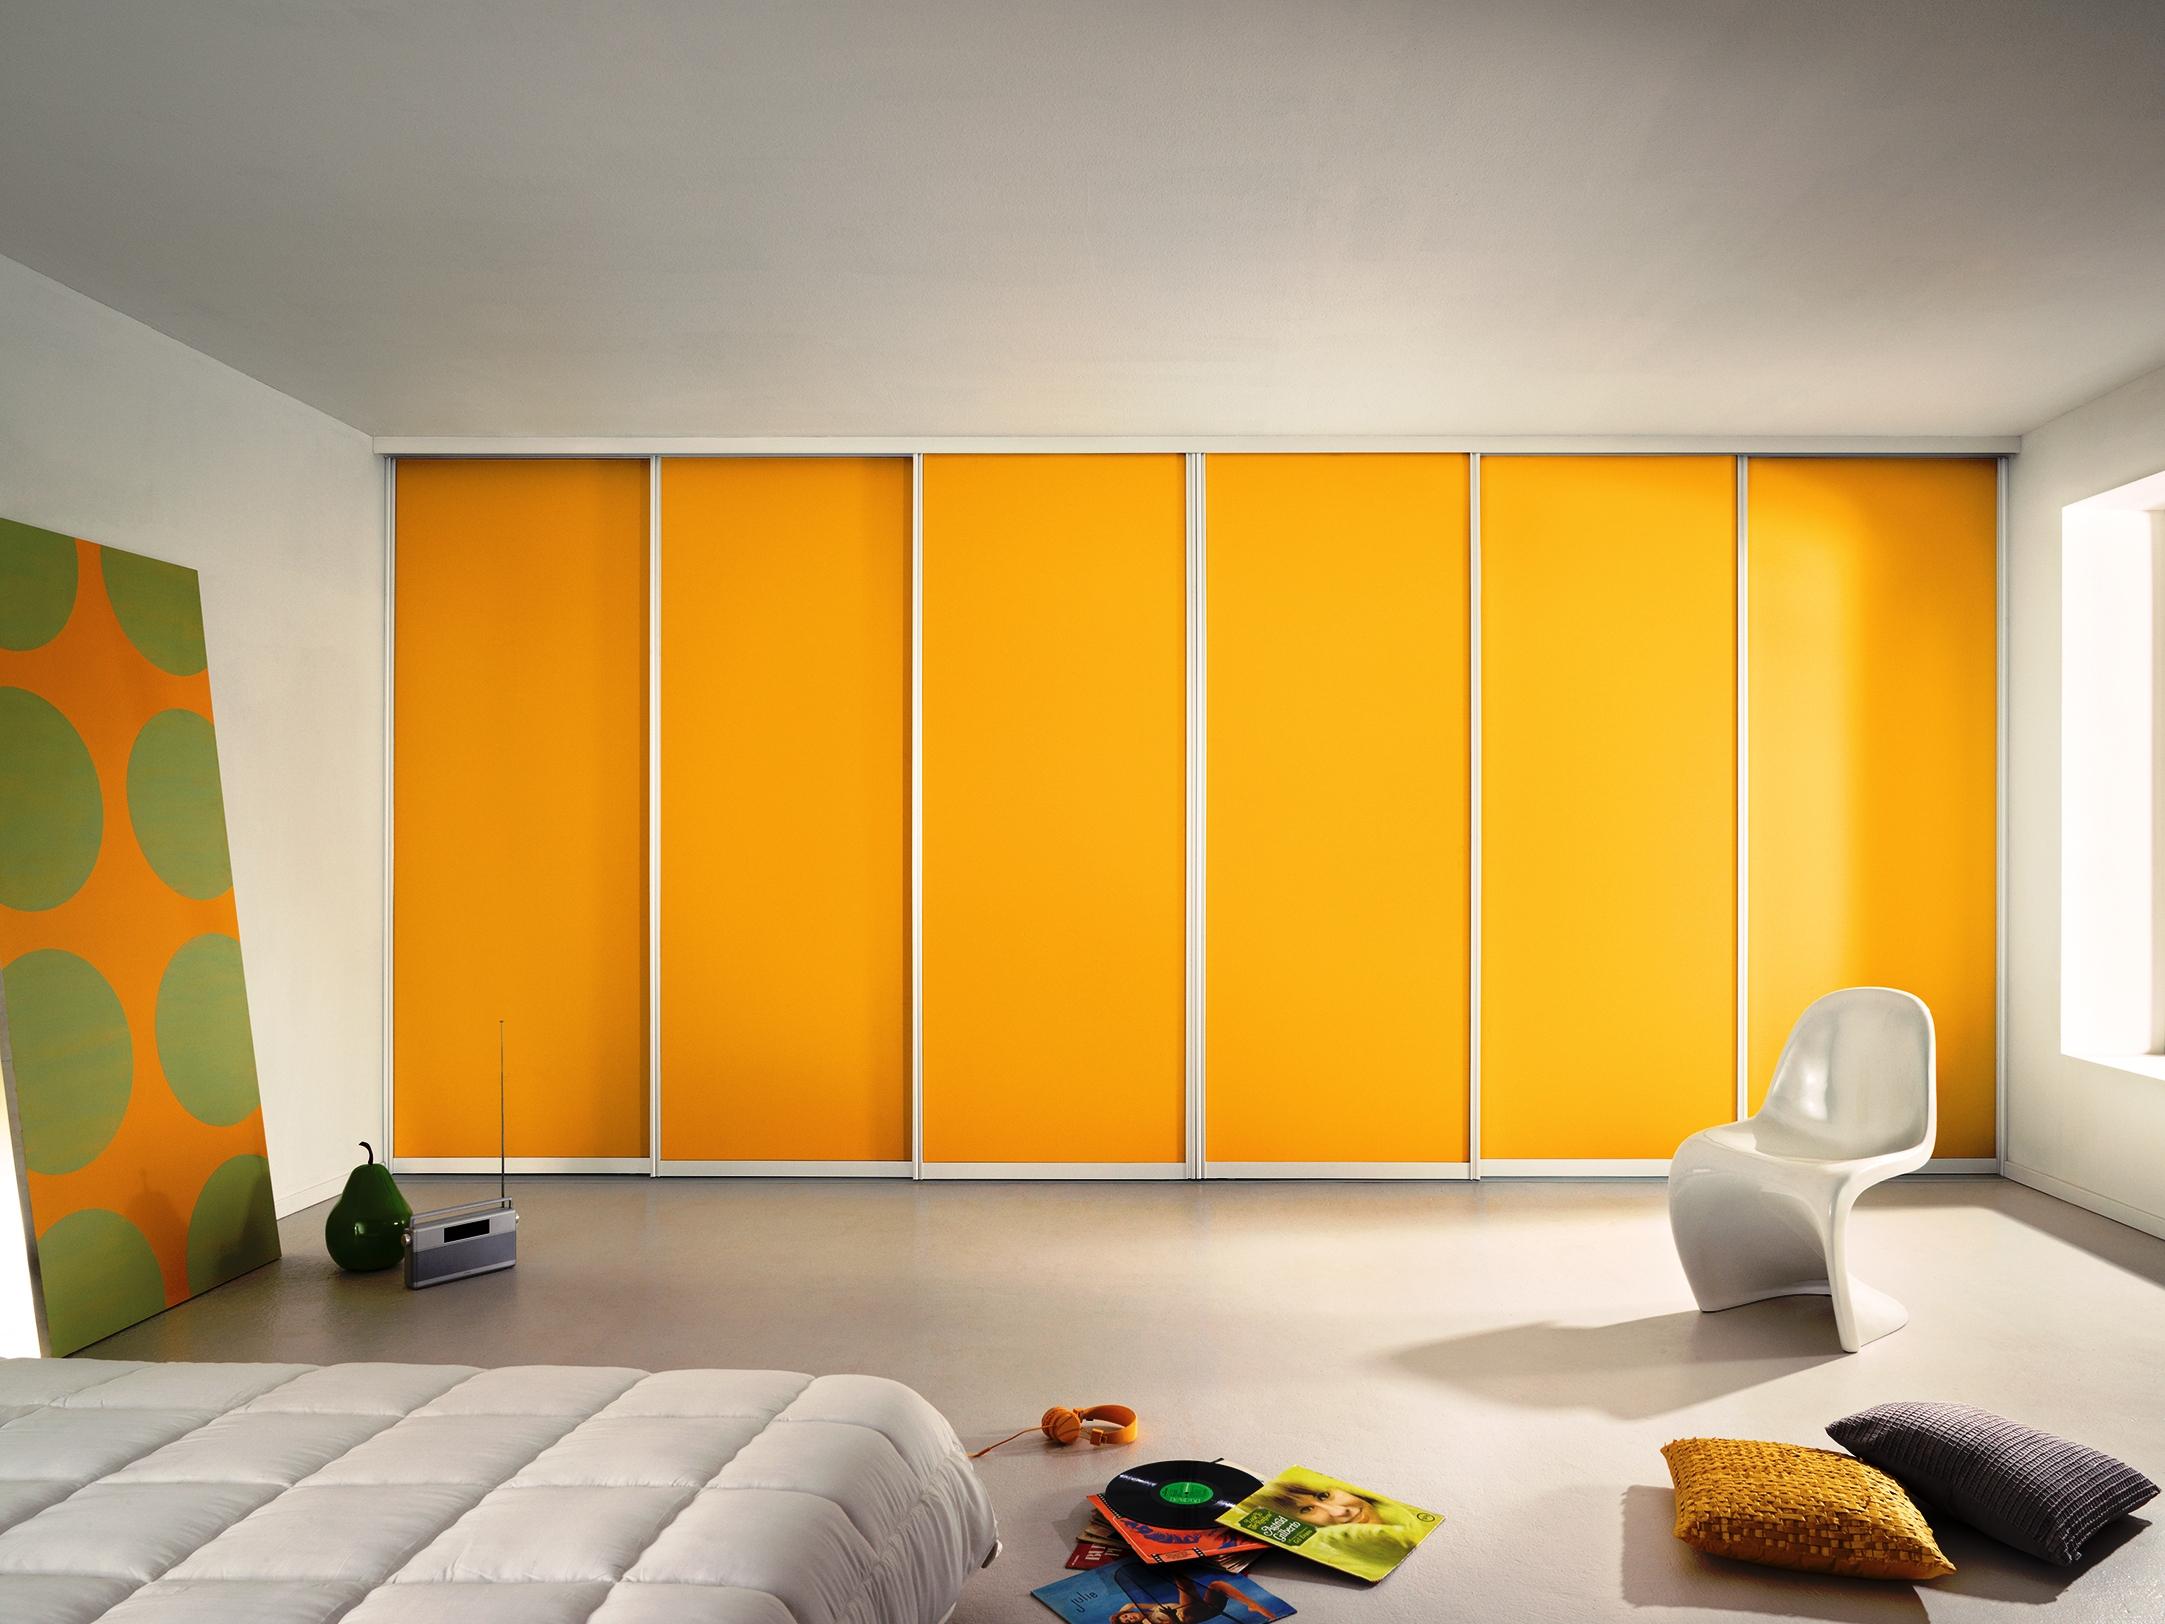 Желтый встроенный шкаф